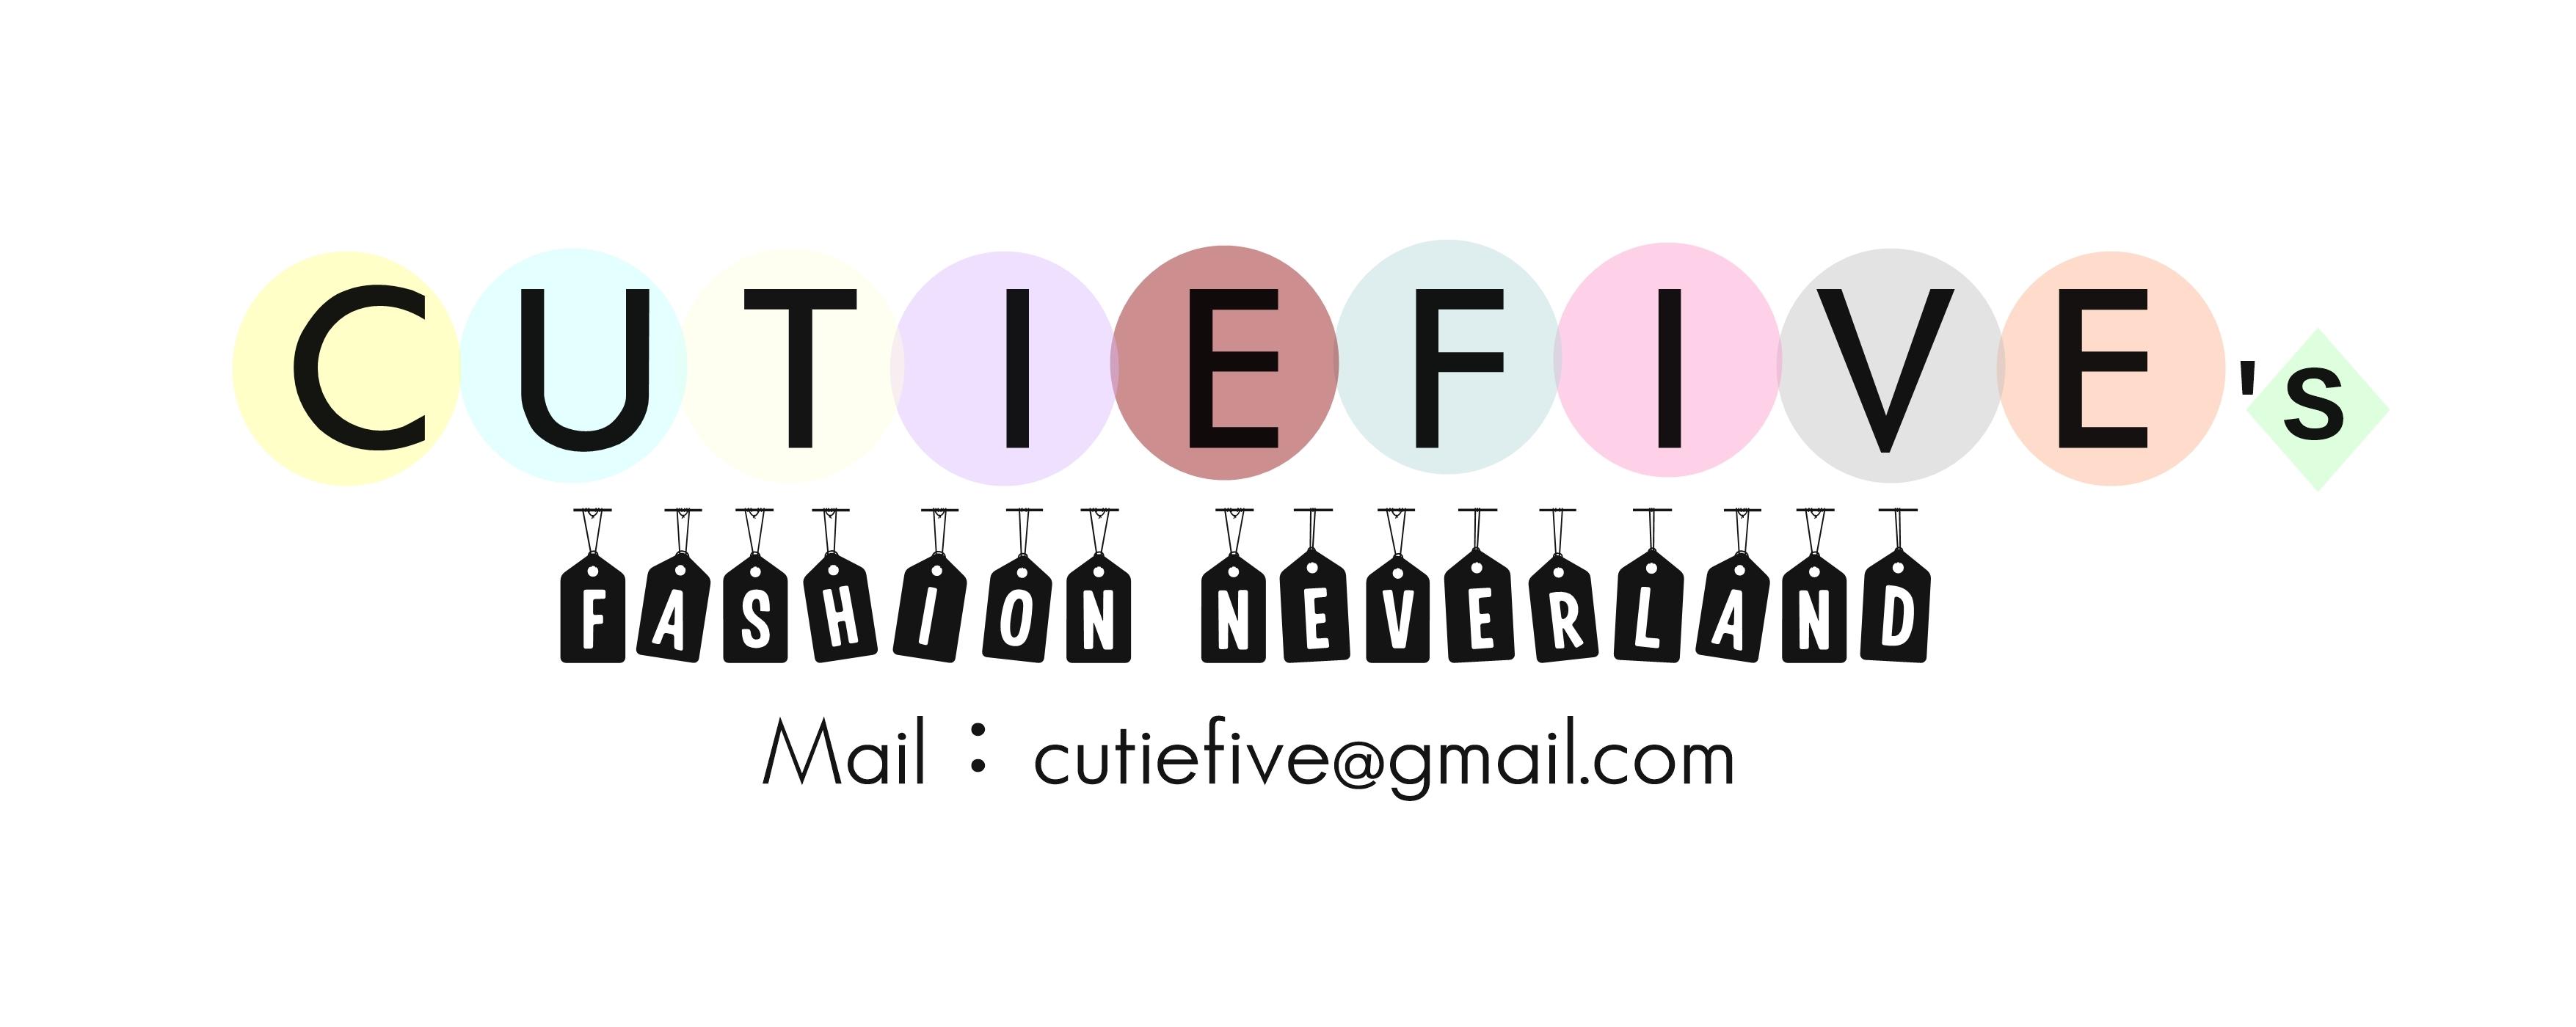 Cutiefive's Fashion Neverland